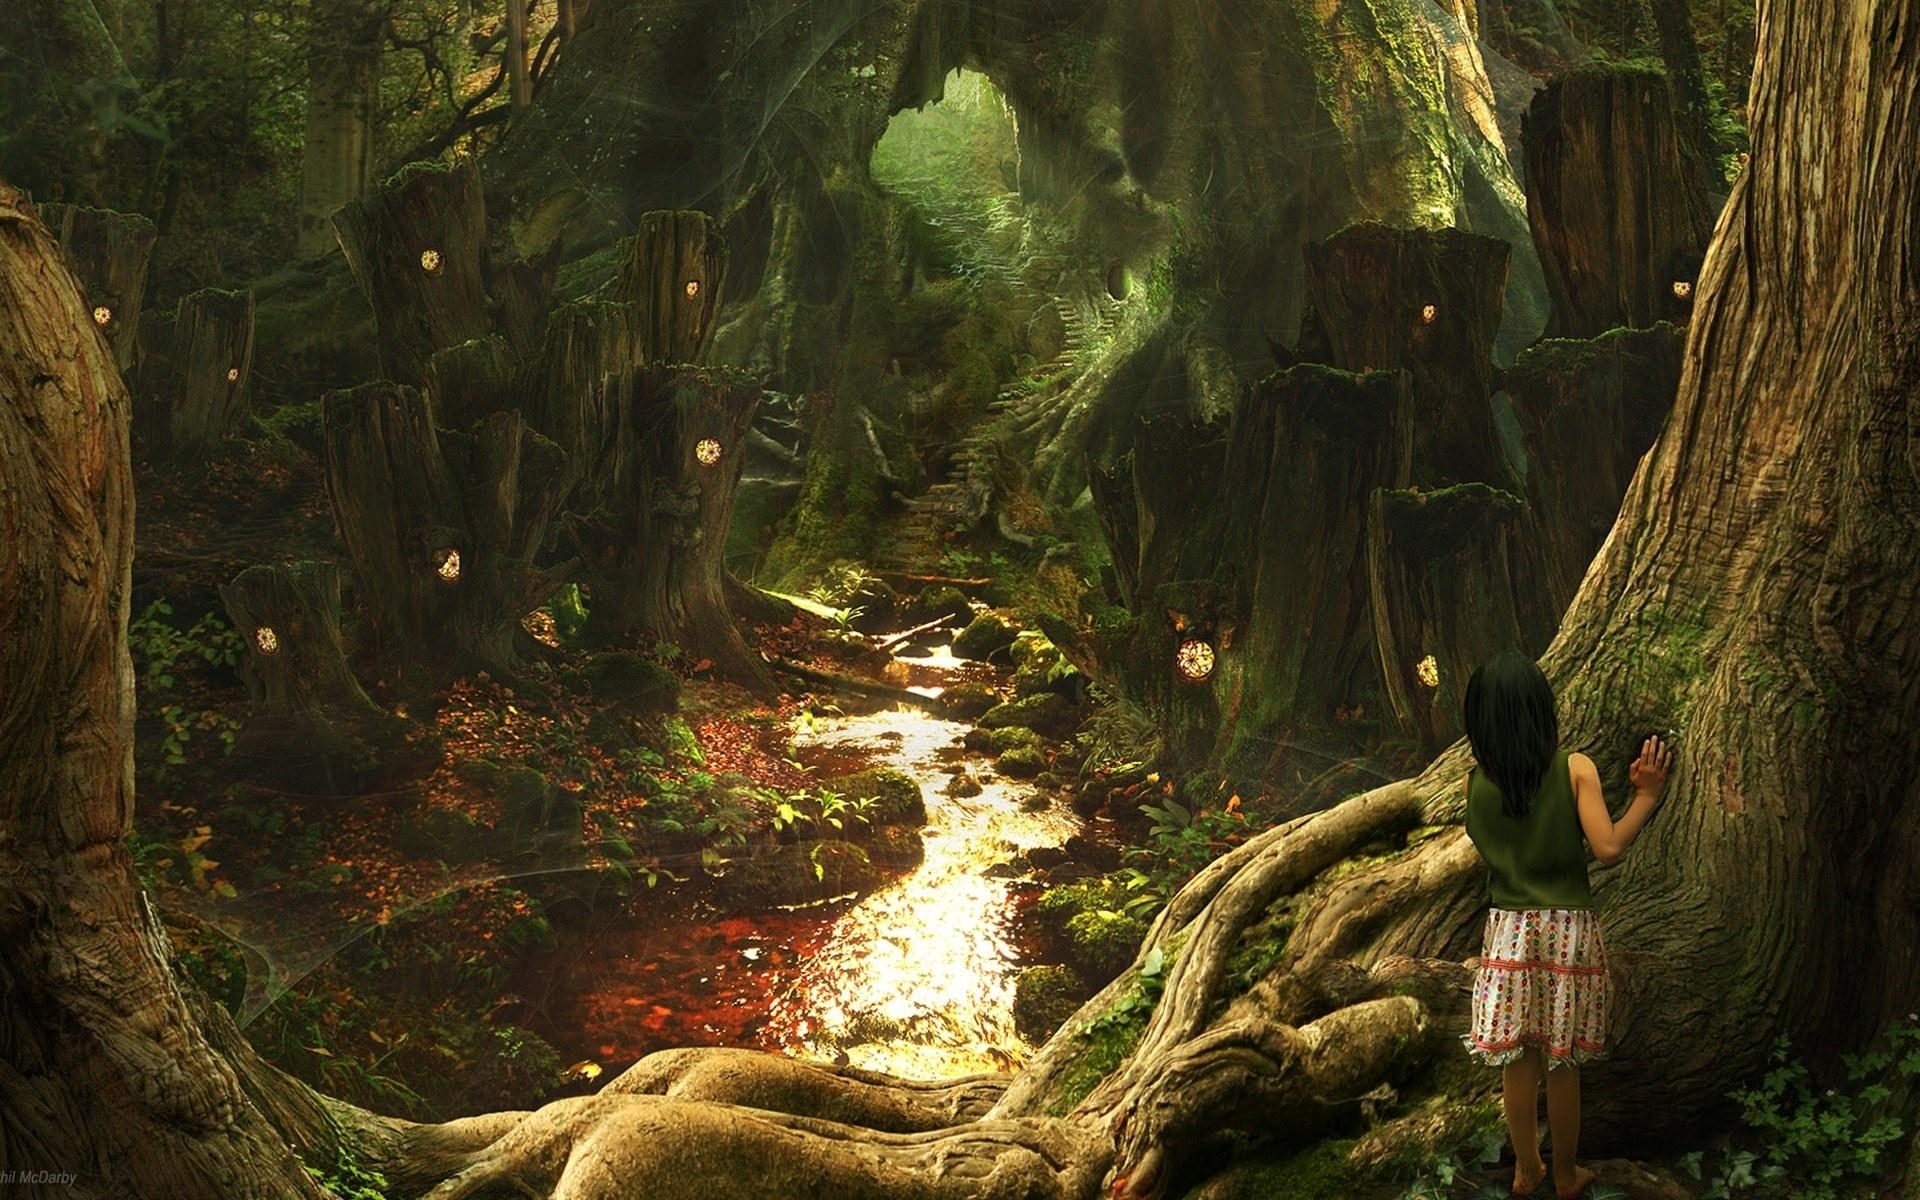 enchanted forest wallpapers hd | pixelstalk